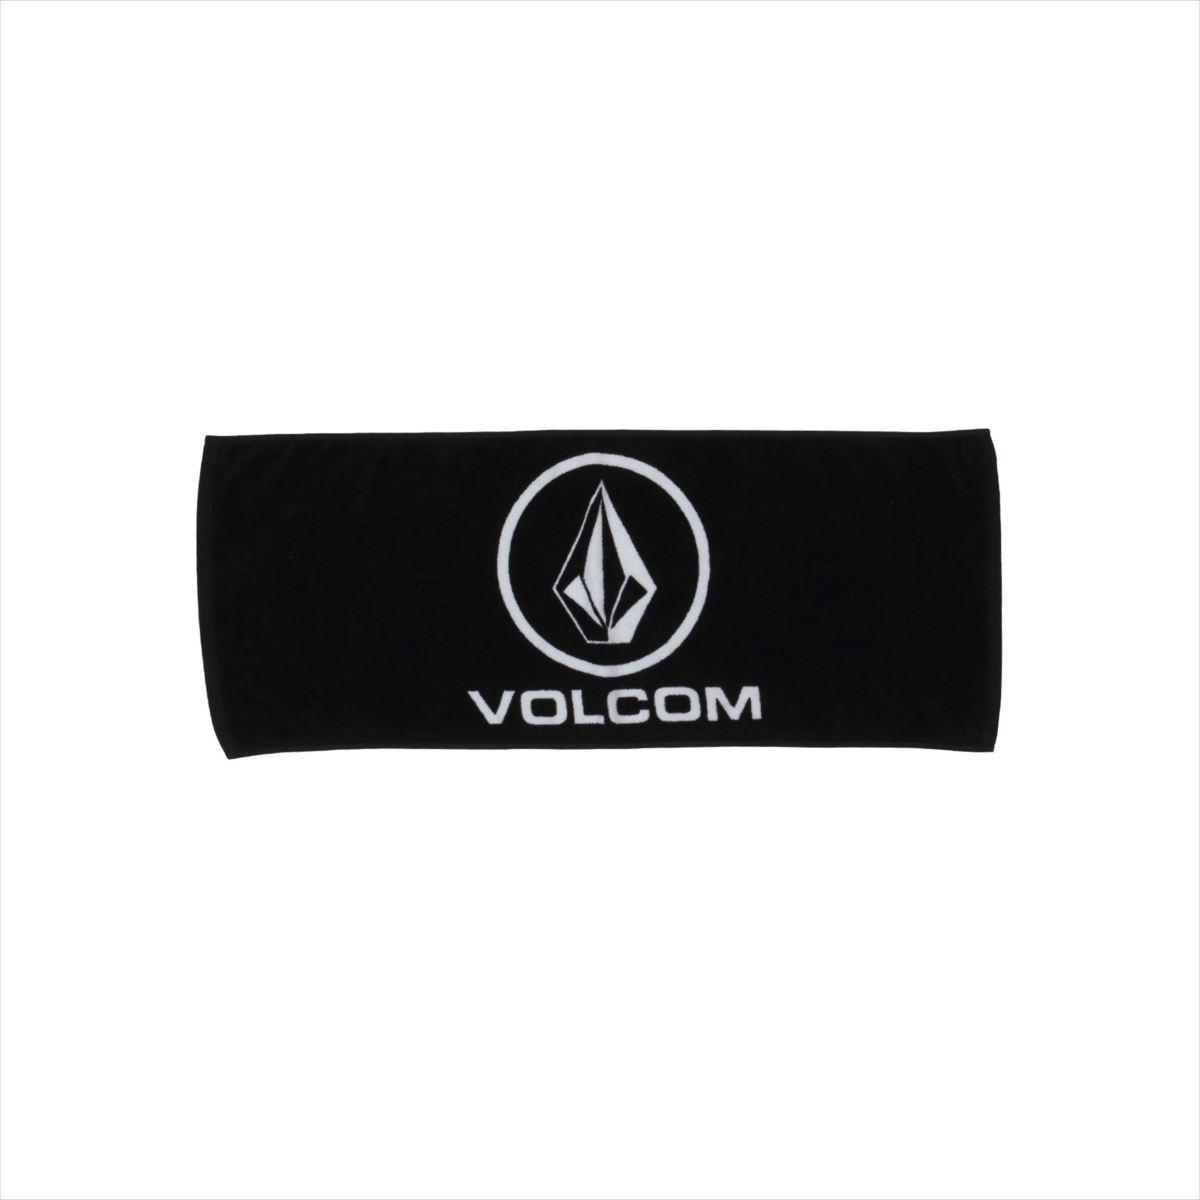 VOLCOM タオル/ボルコム タオル/VOLCOM フェイスタオル/ボルコム フェイスタオル/16-17 FADE STONE FACE TOWEL/D72216JB